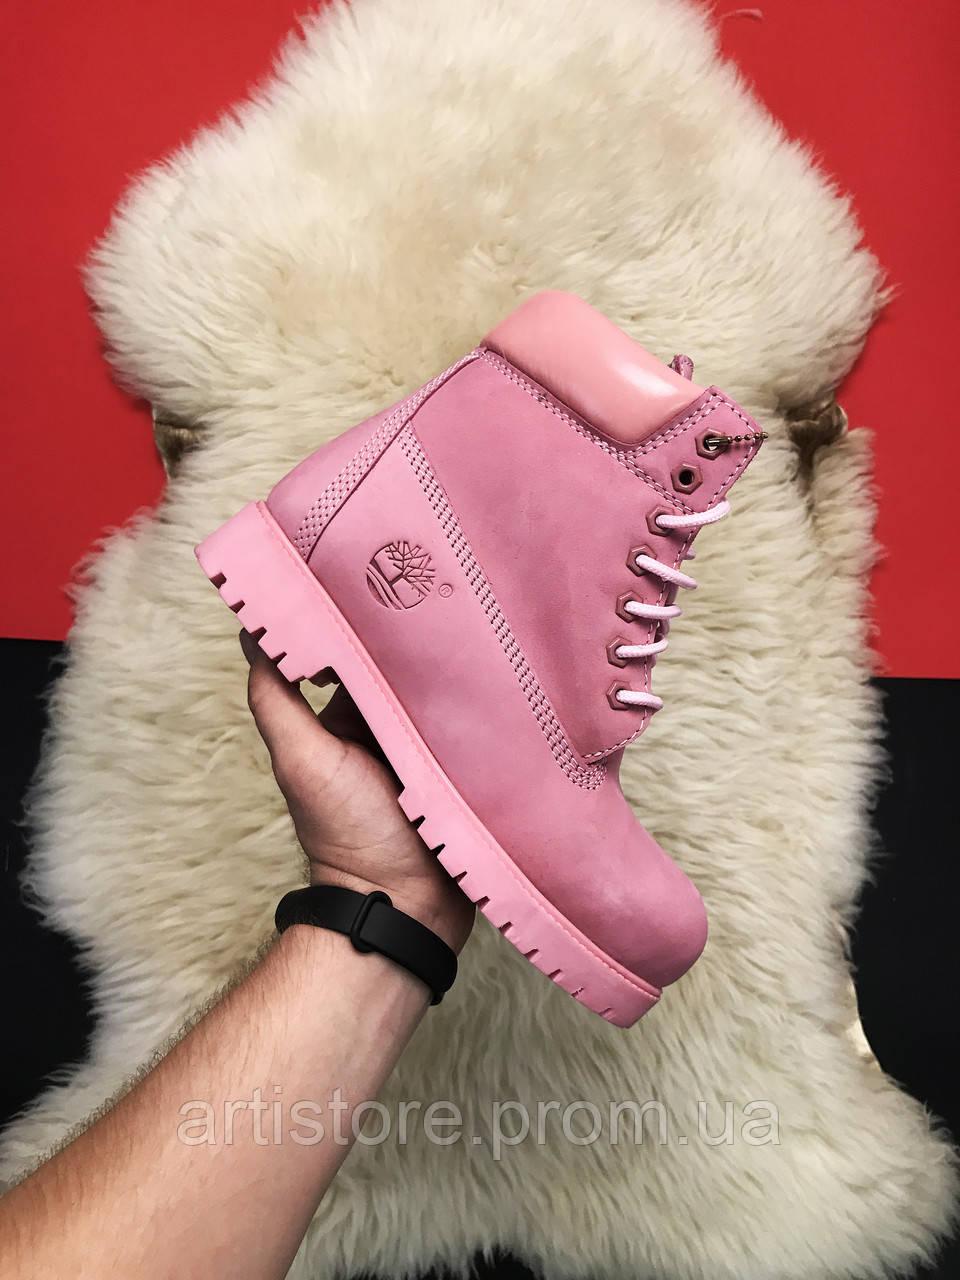 Timberland Pink Fure Premium